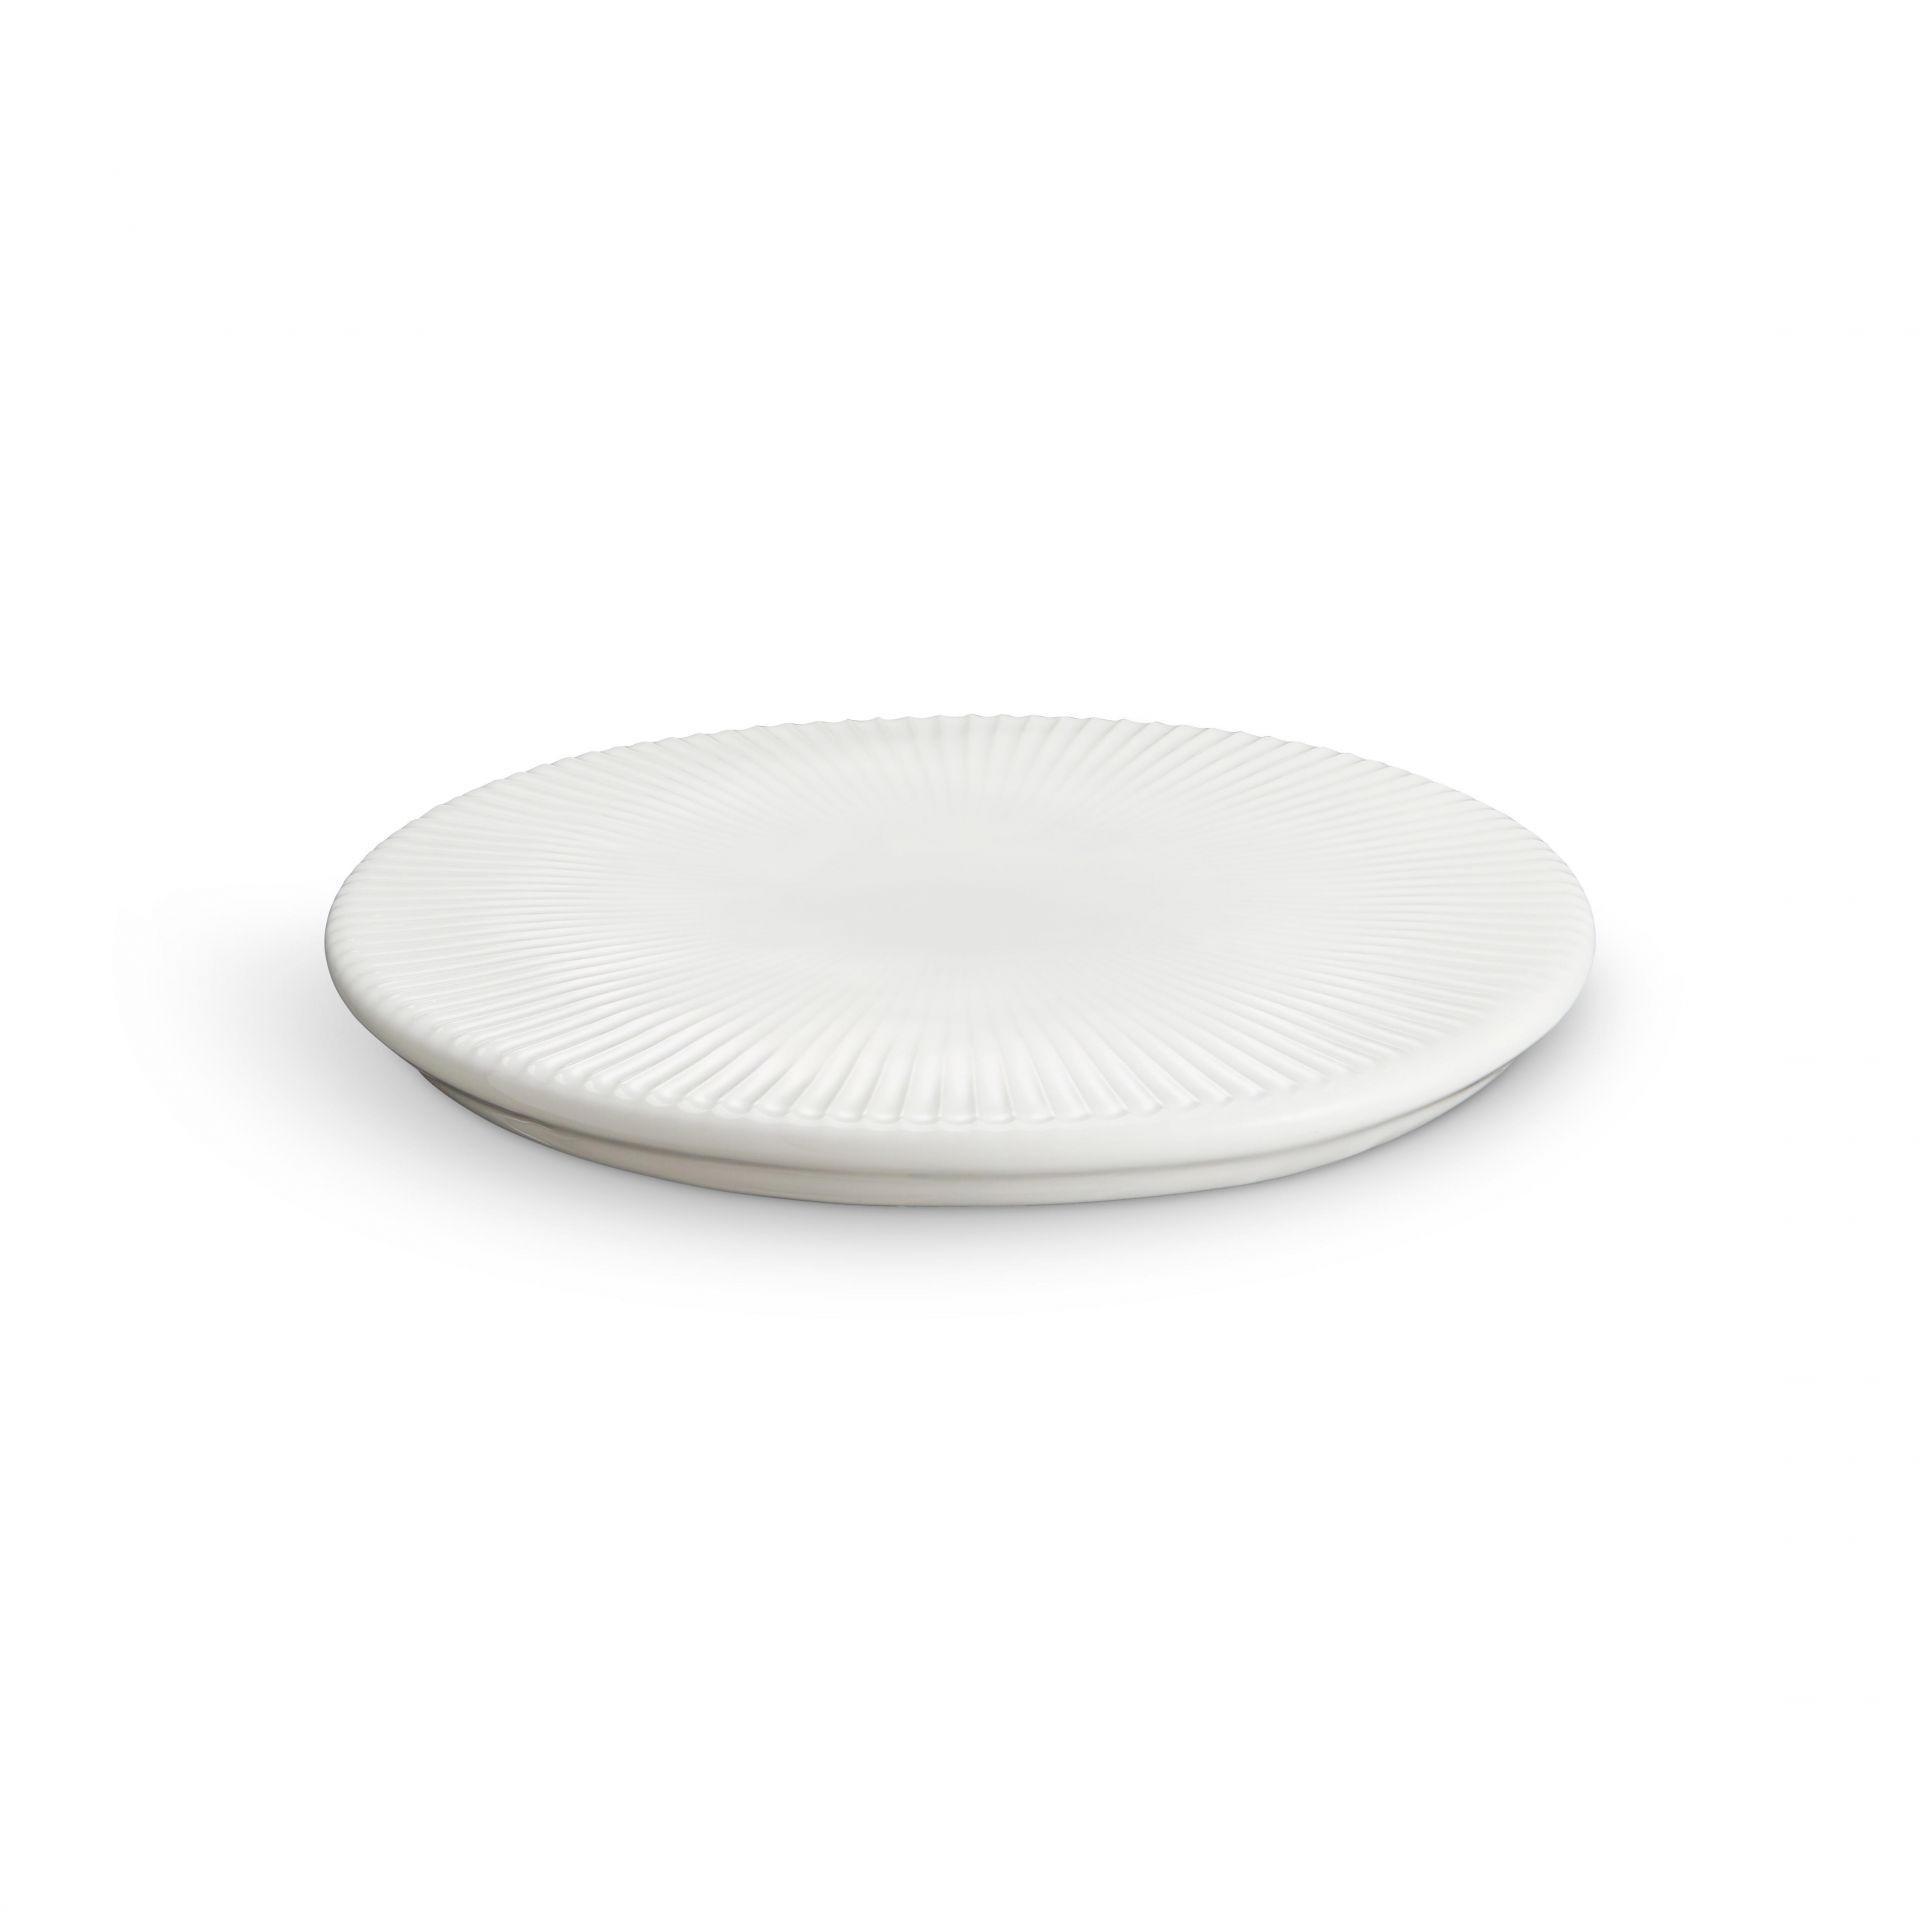 KÄHLER Keramický servírovací talířek Hammershøi White, bílá barva, keramika